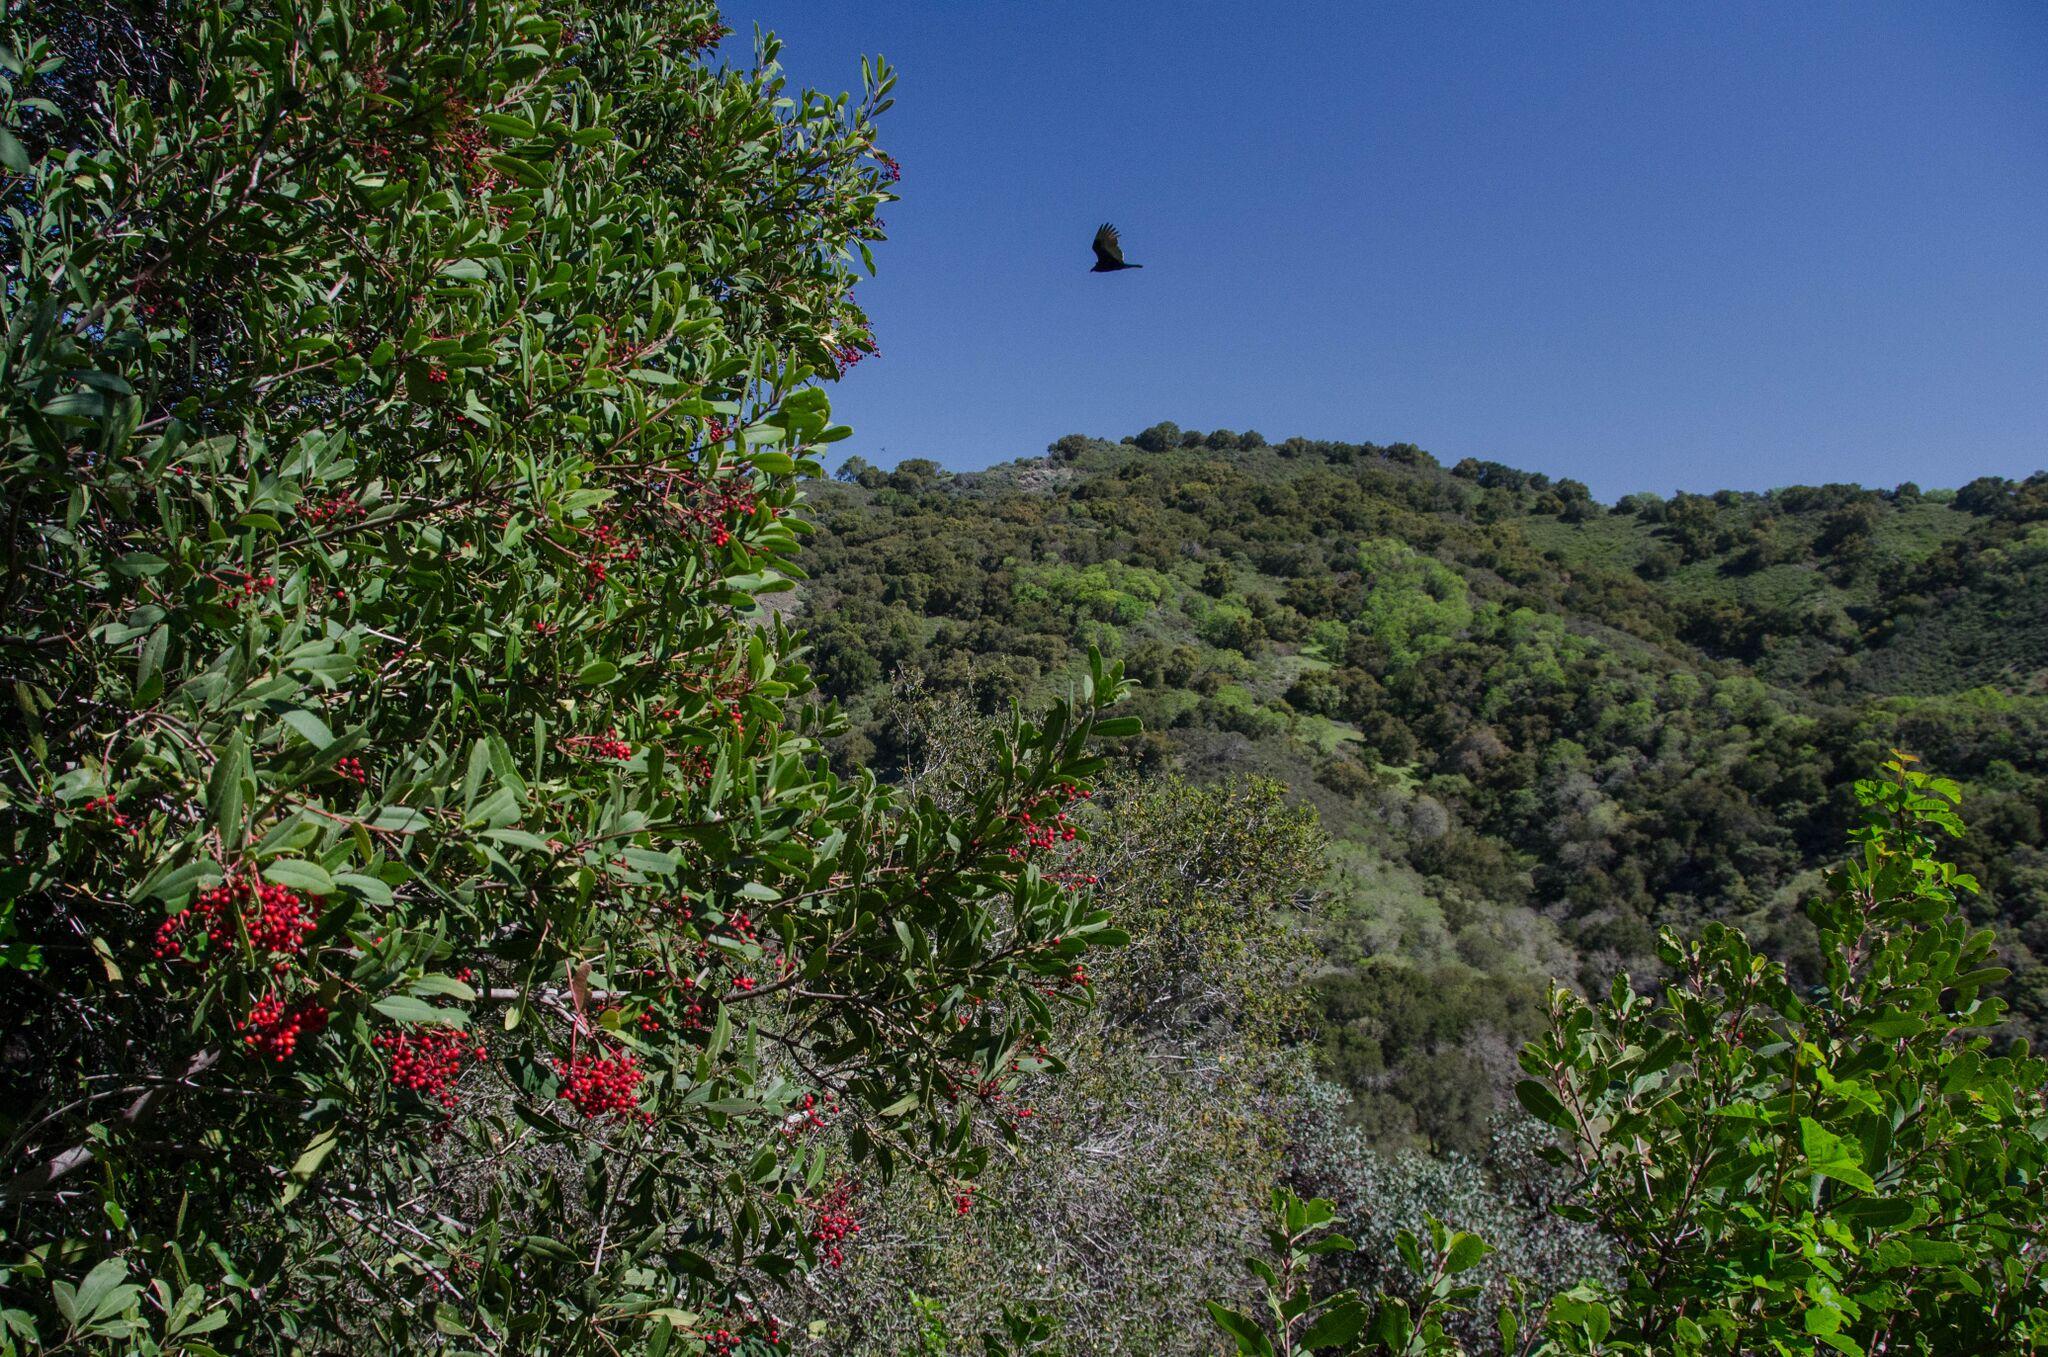 Mayfair-Trail_Rancho-Canada-del-Oro-Open-Space-Preserve_Cassie-Kifer-10_preview